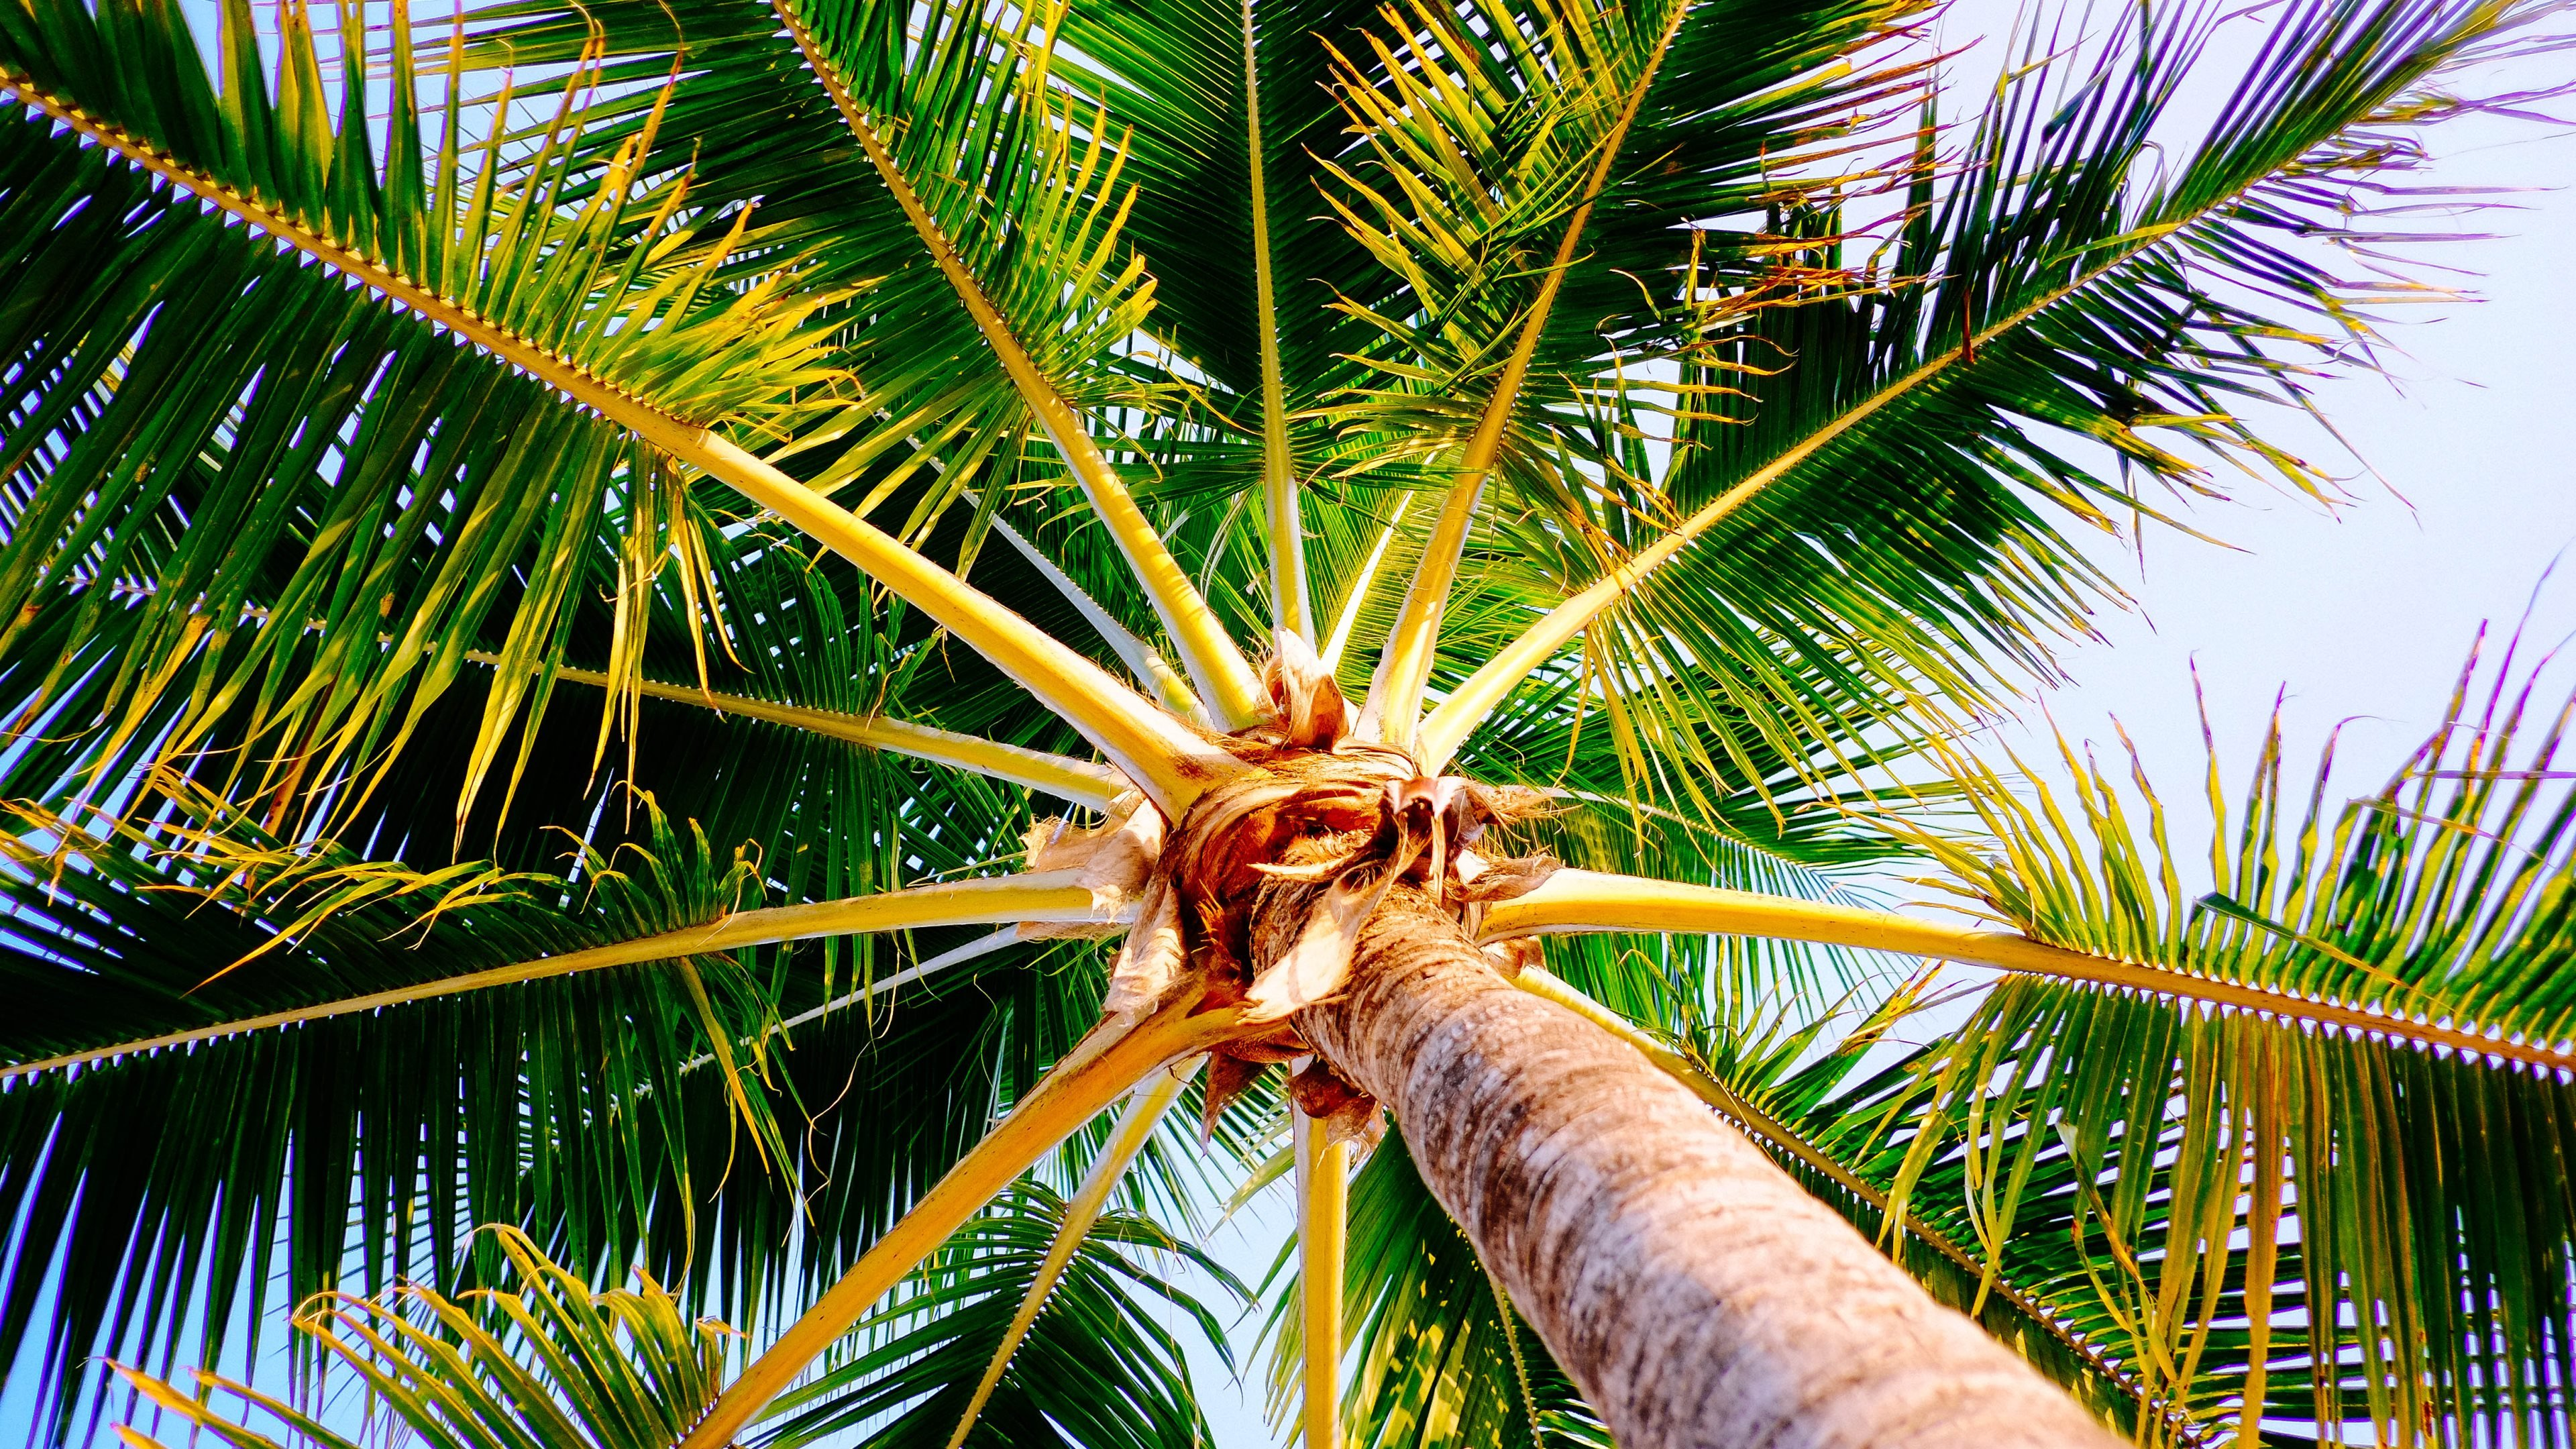 Best Palm Tree Wallpaper Id - Palm Trees Wallpapers Iphone - HD Wallpaper